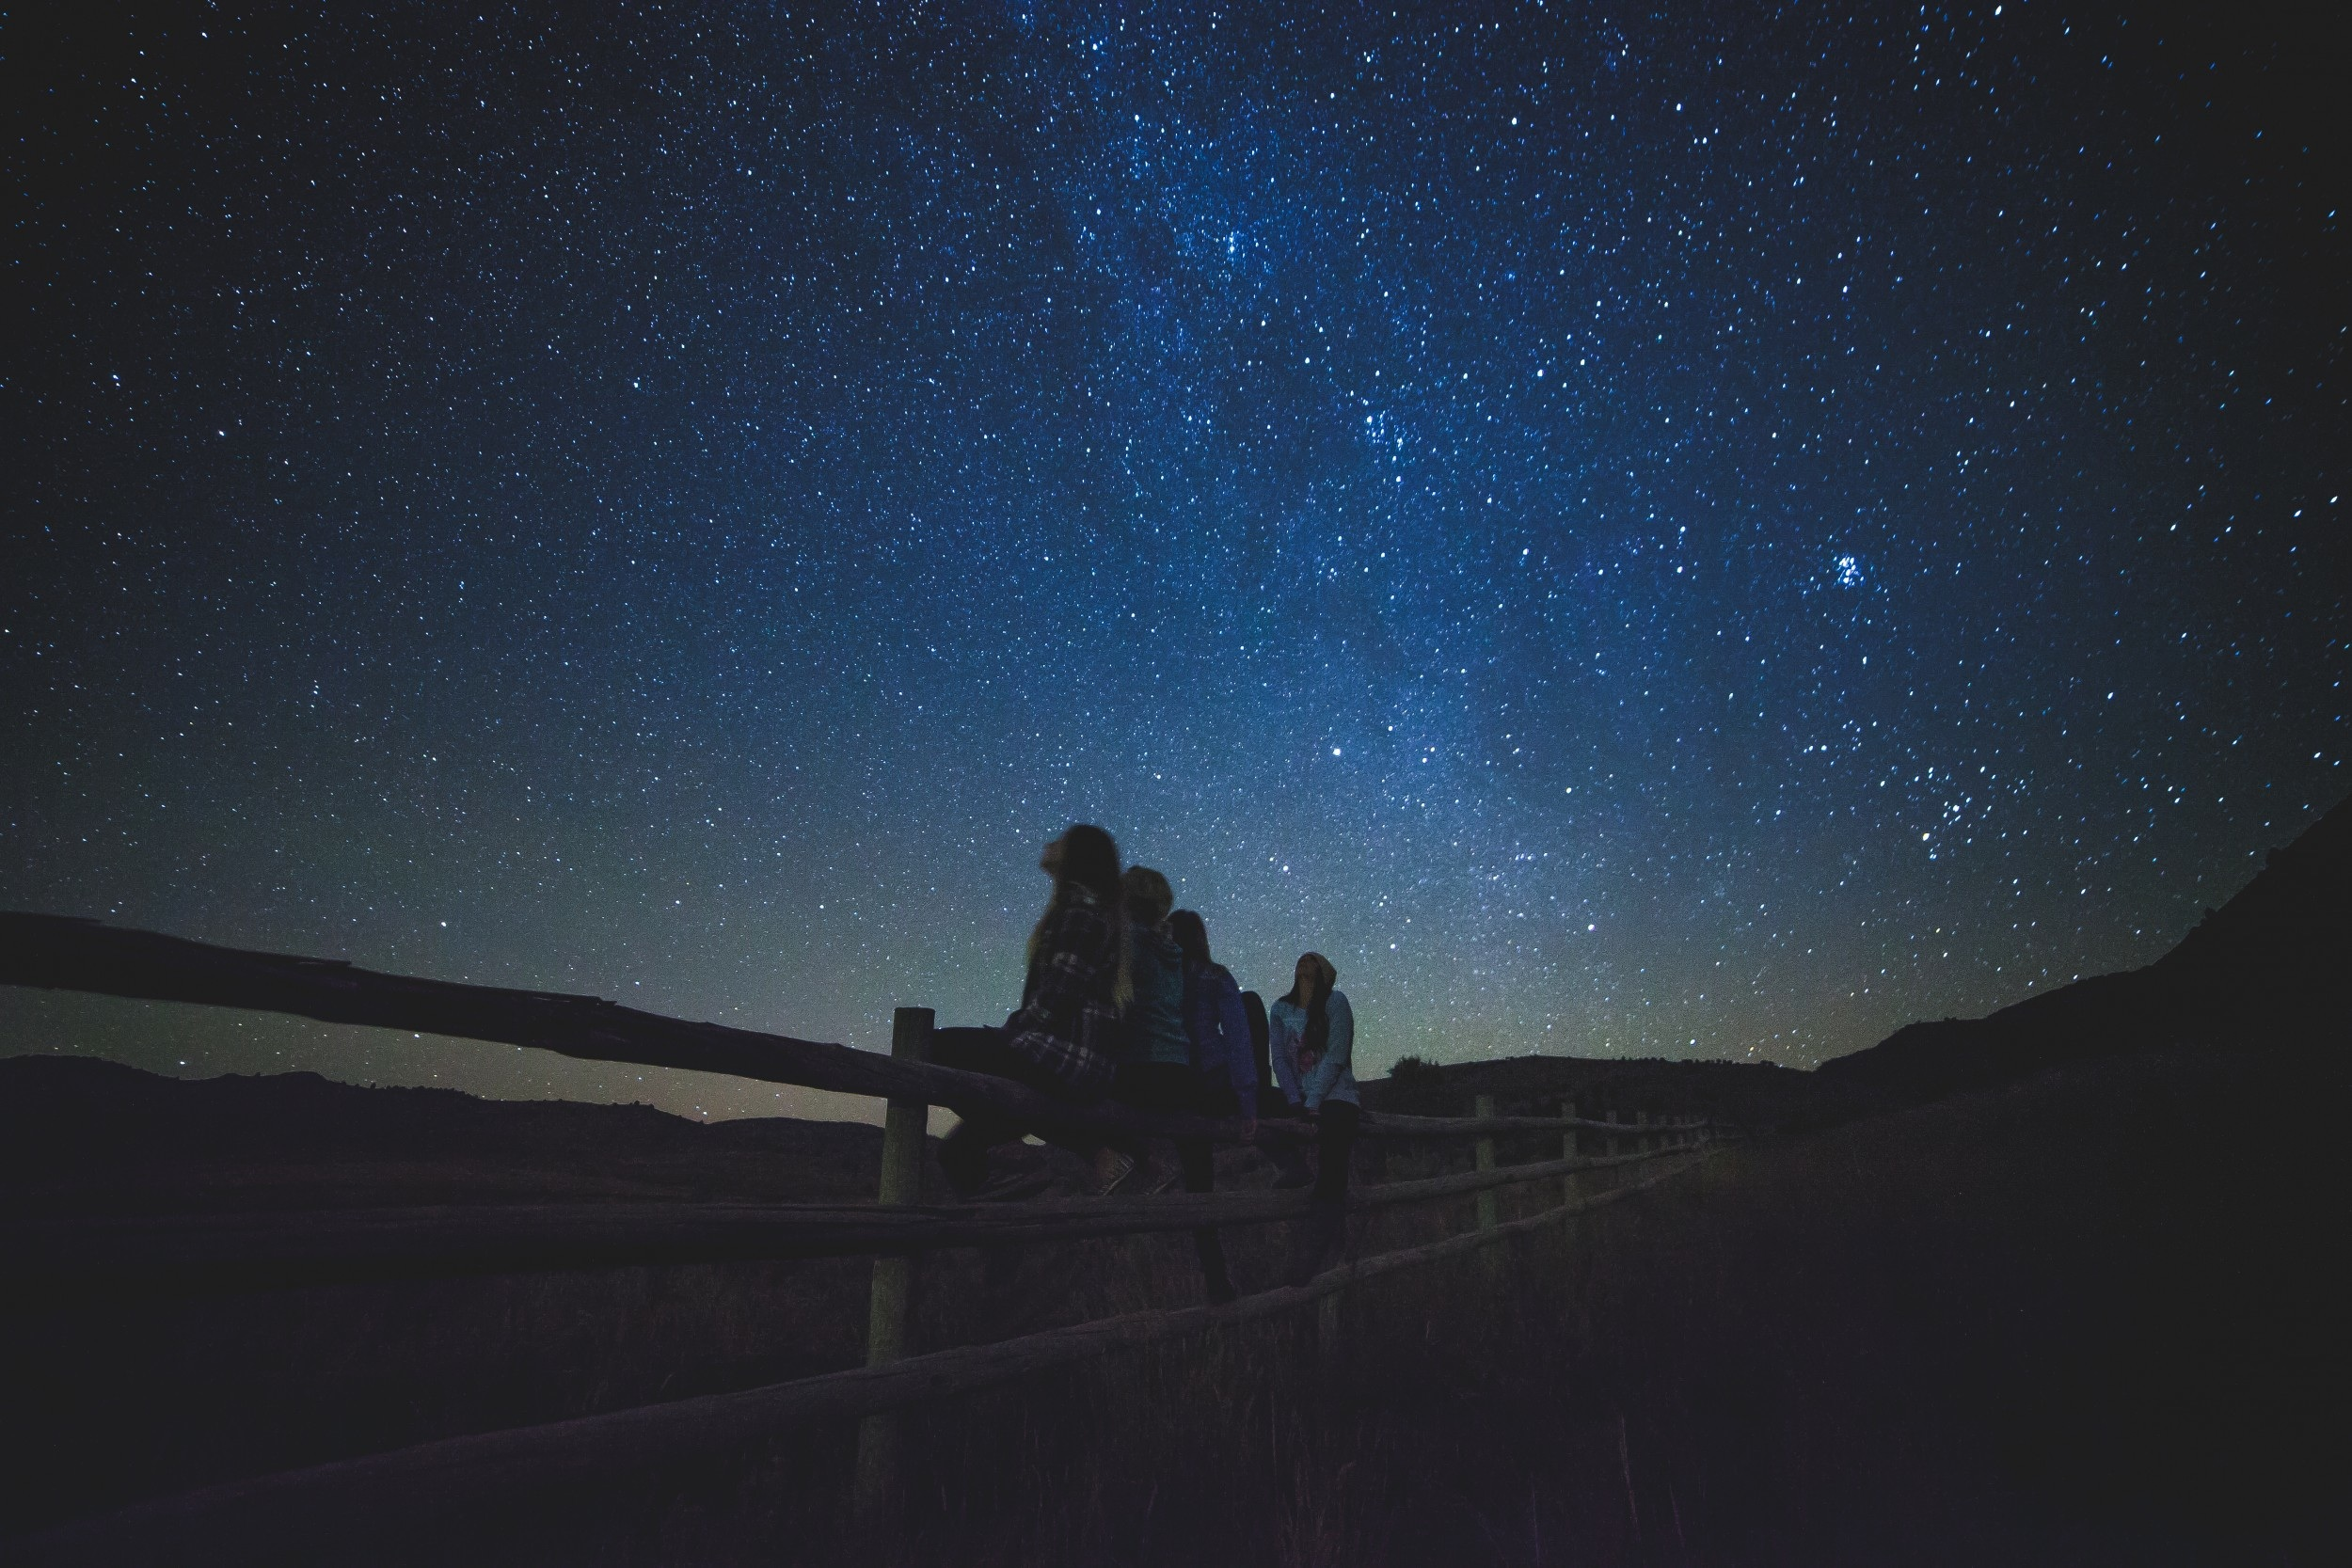 Stars, Dark, Friend, Girl, Light, HQ Photo